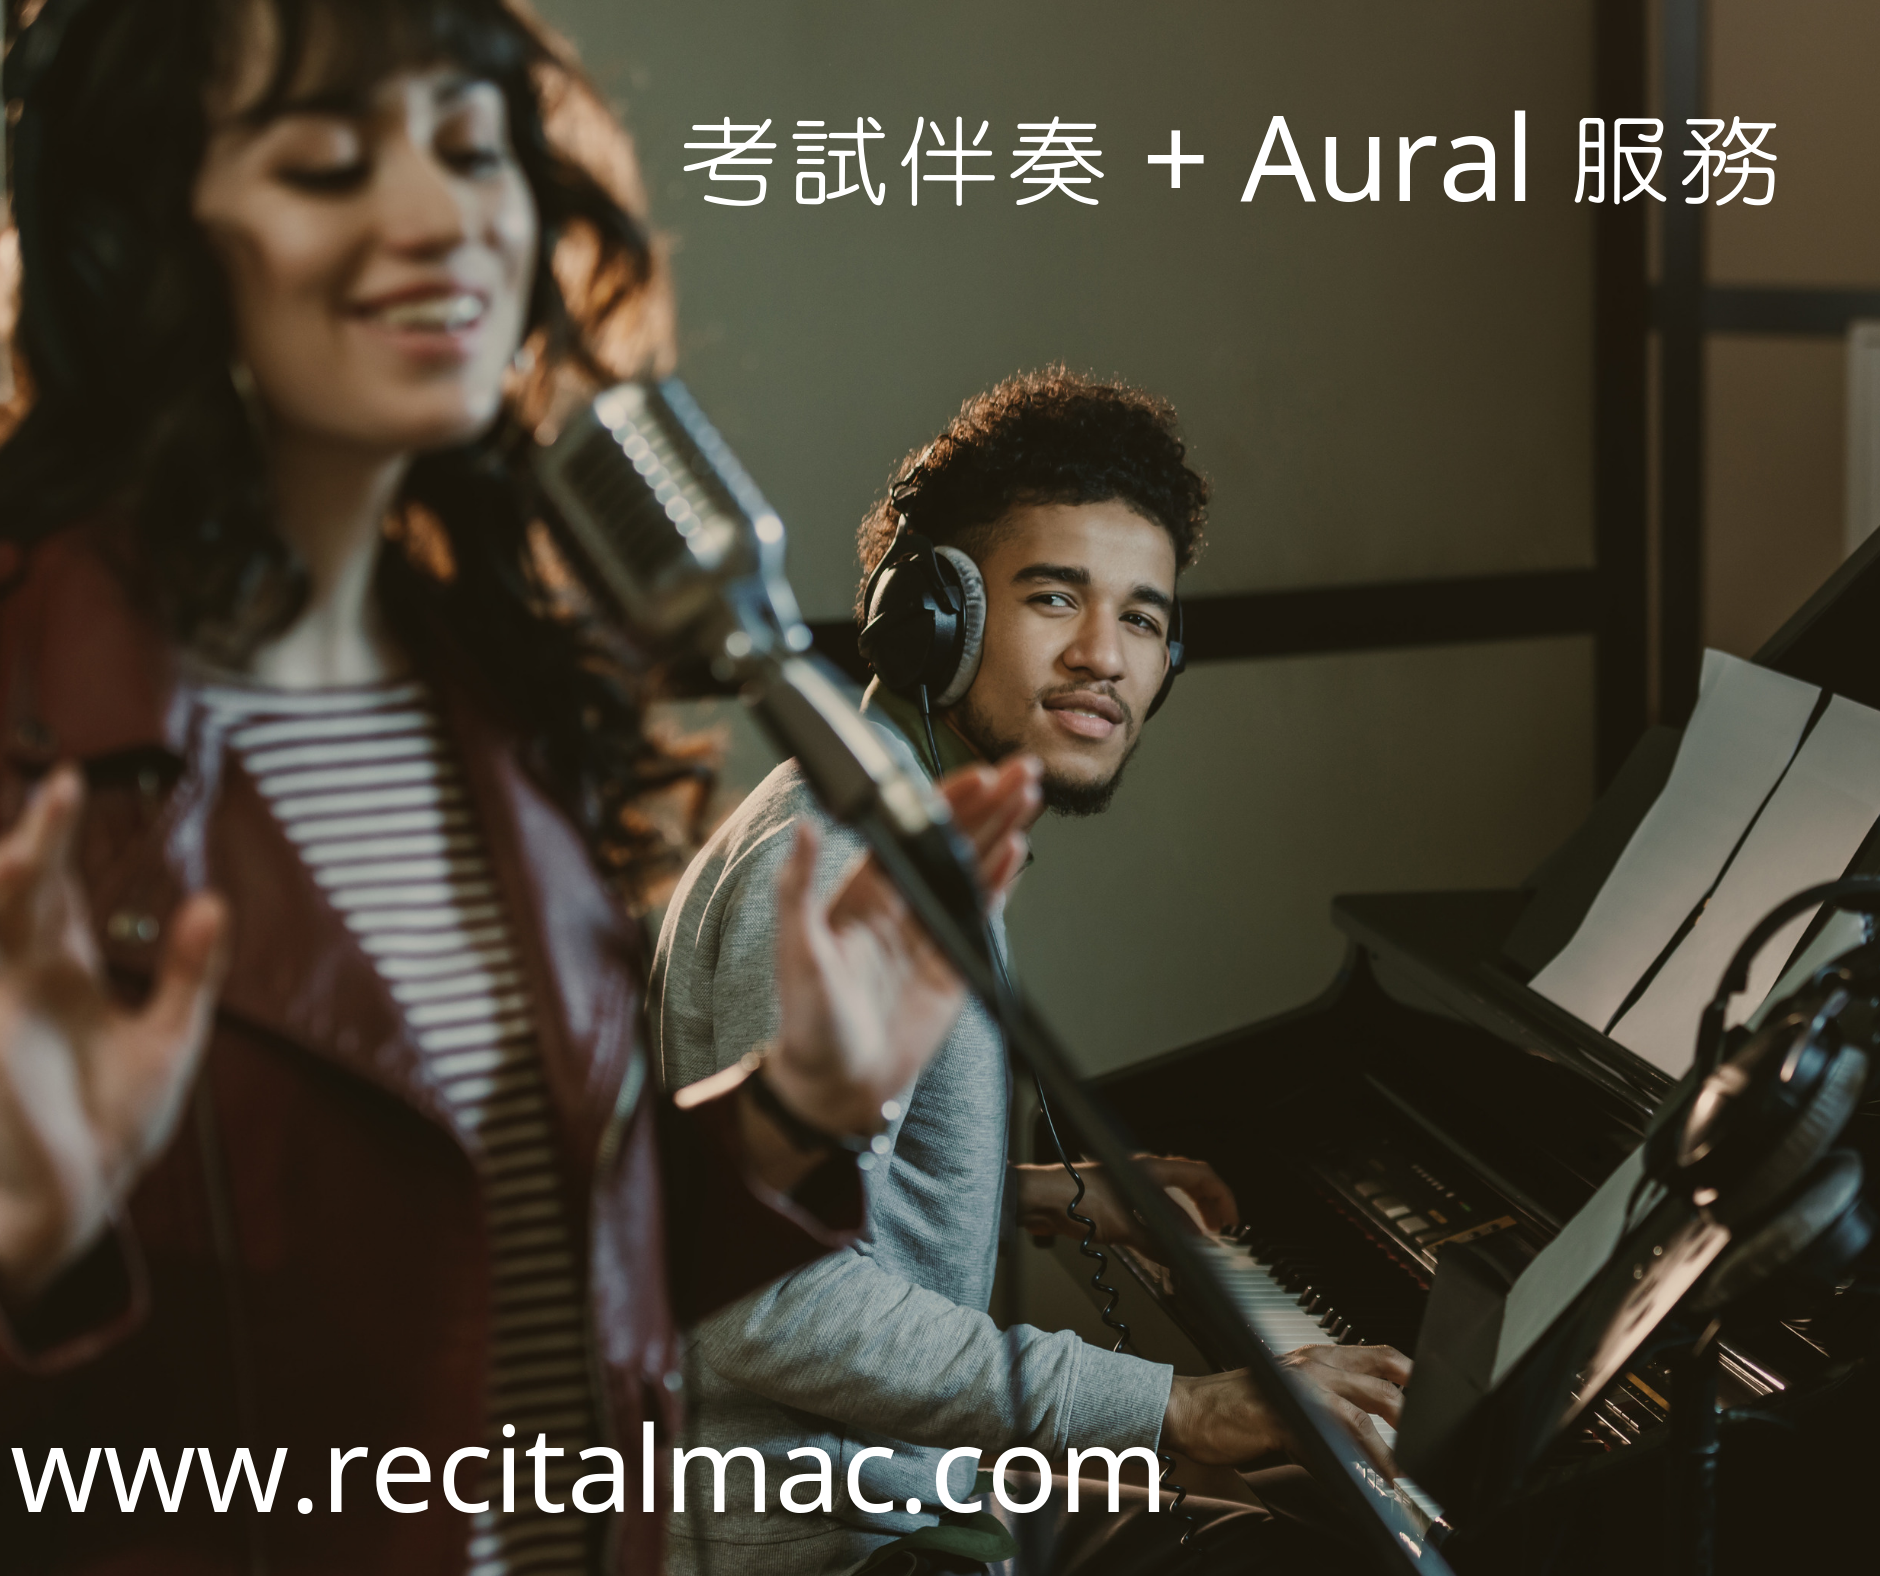 伴奏及Aural 服務